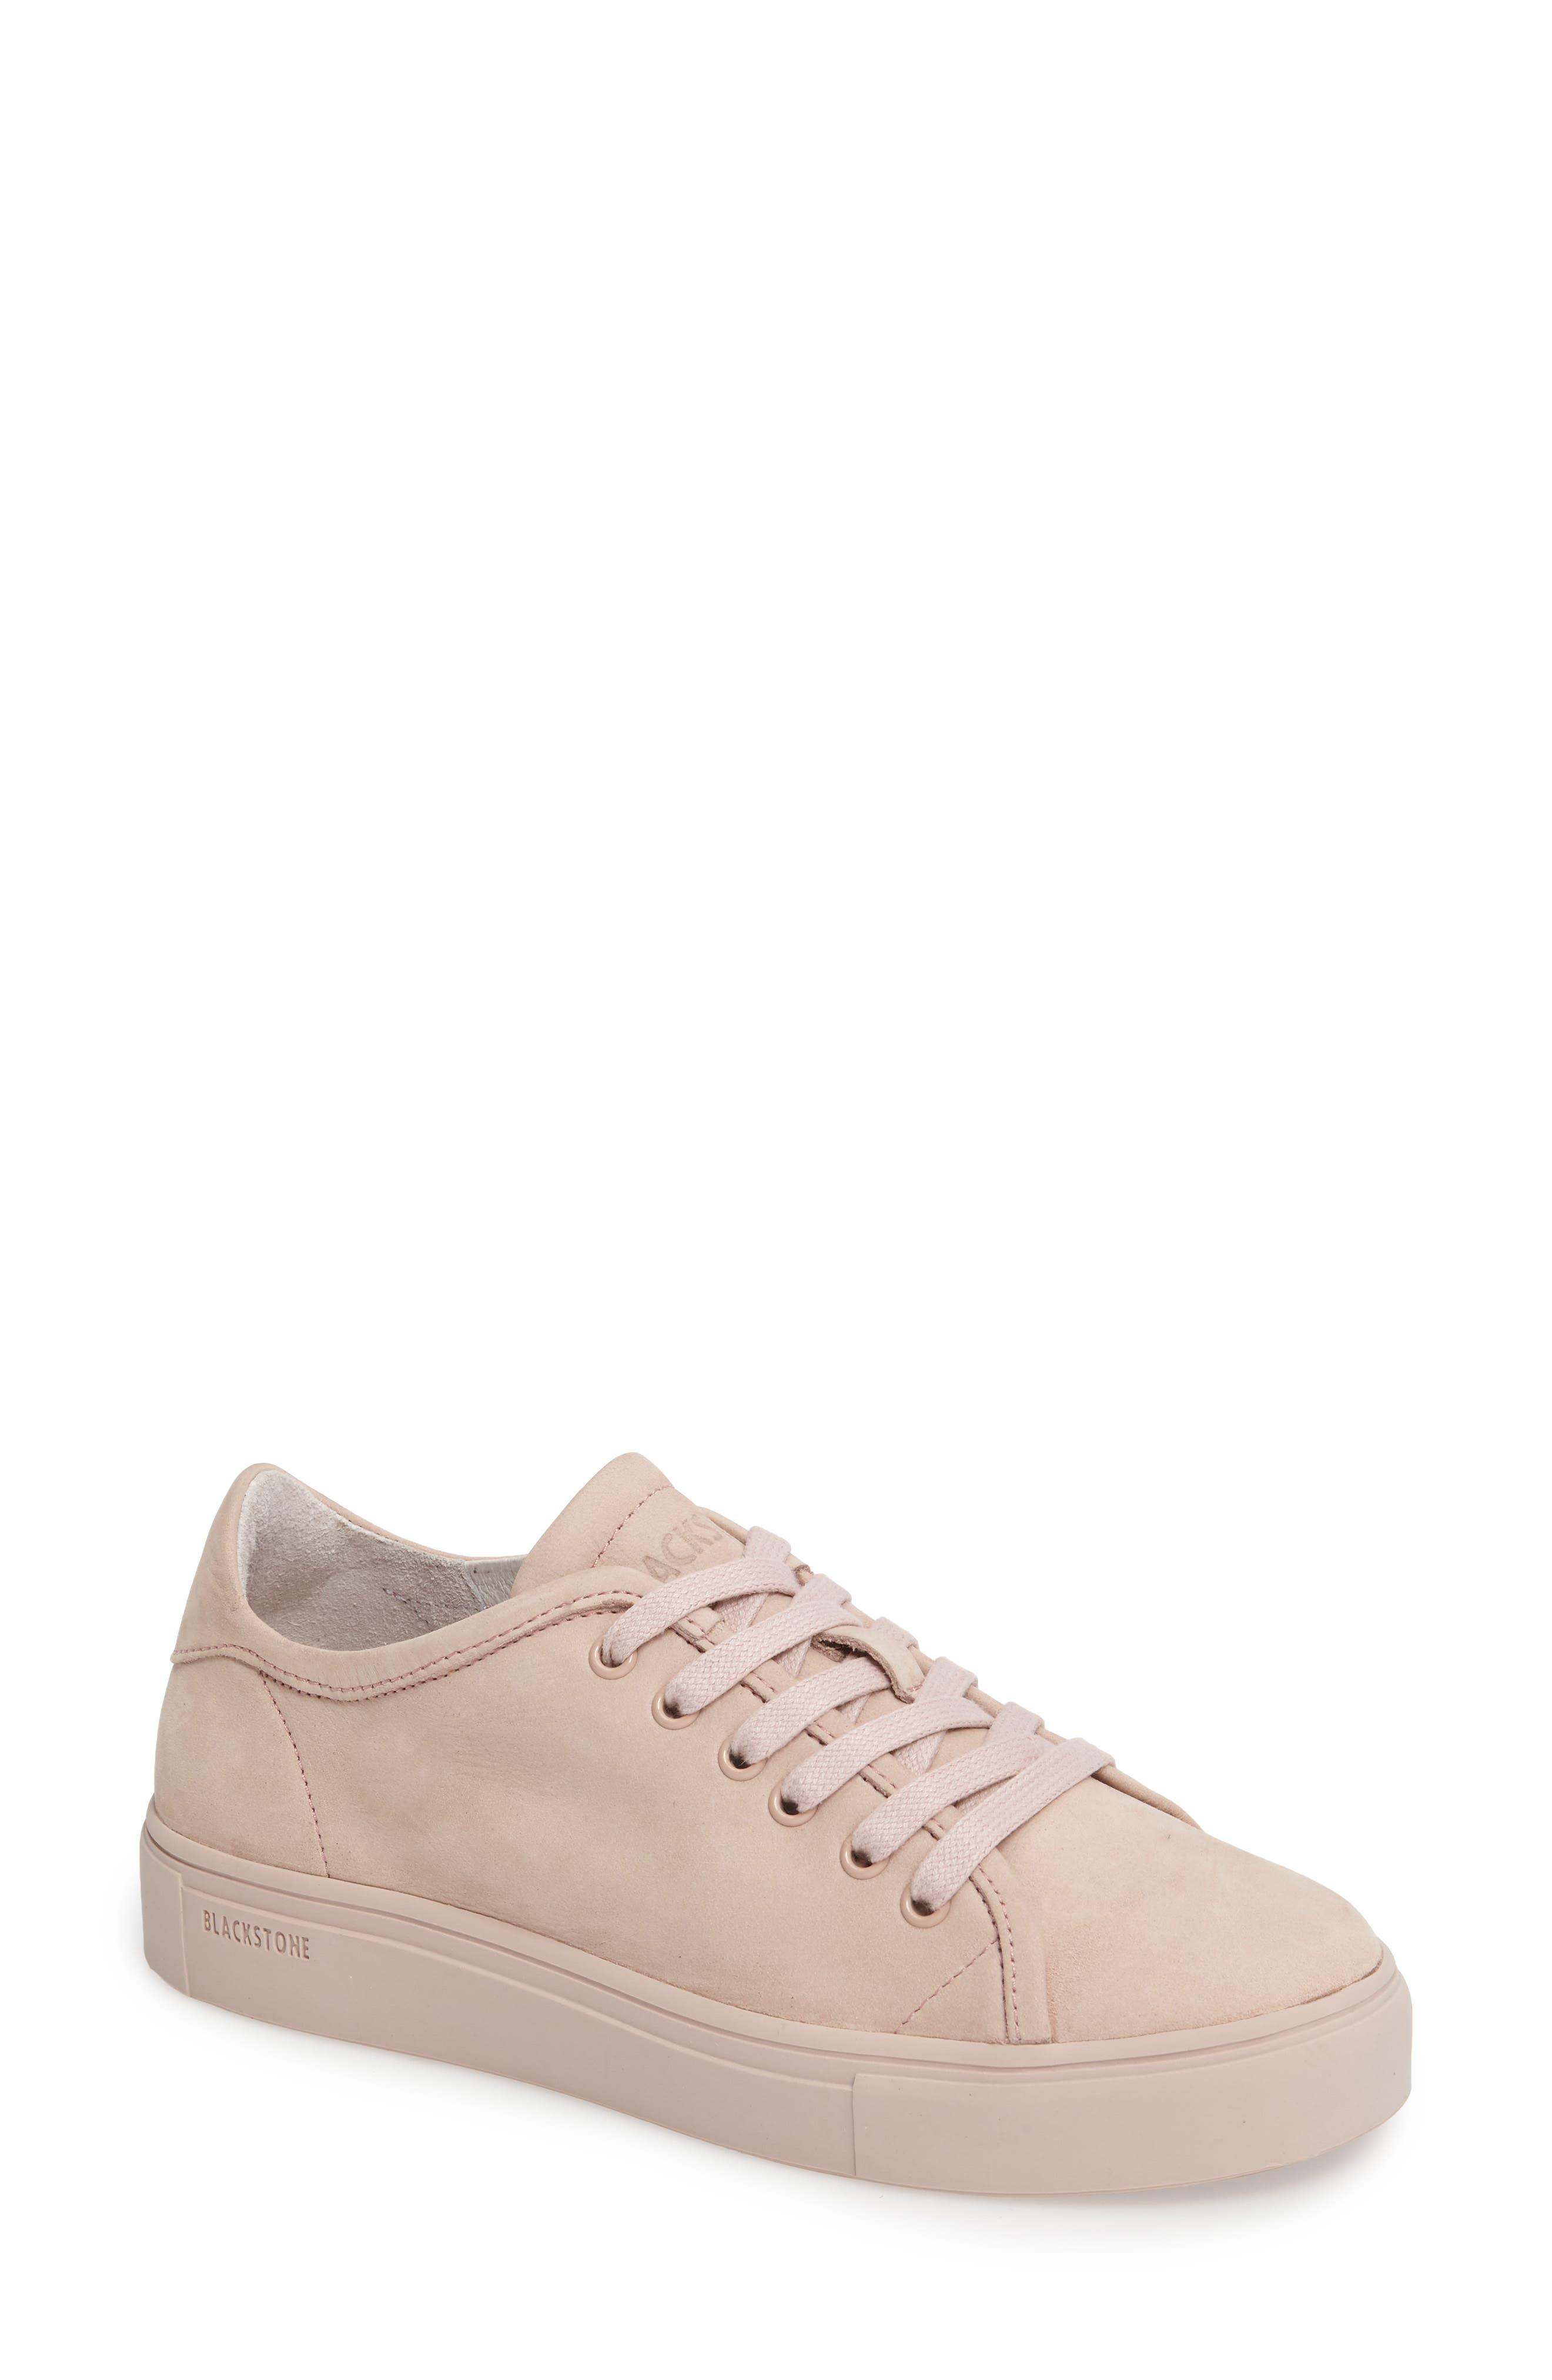 NL33 Sneaker,                         Main,                         color, Dusty Rose Nubuck